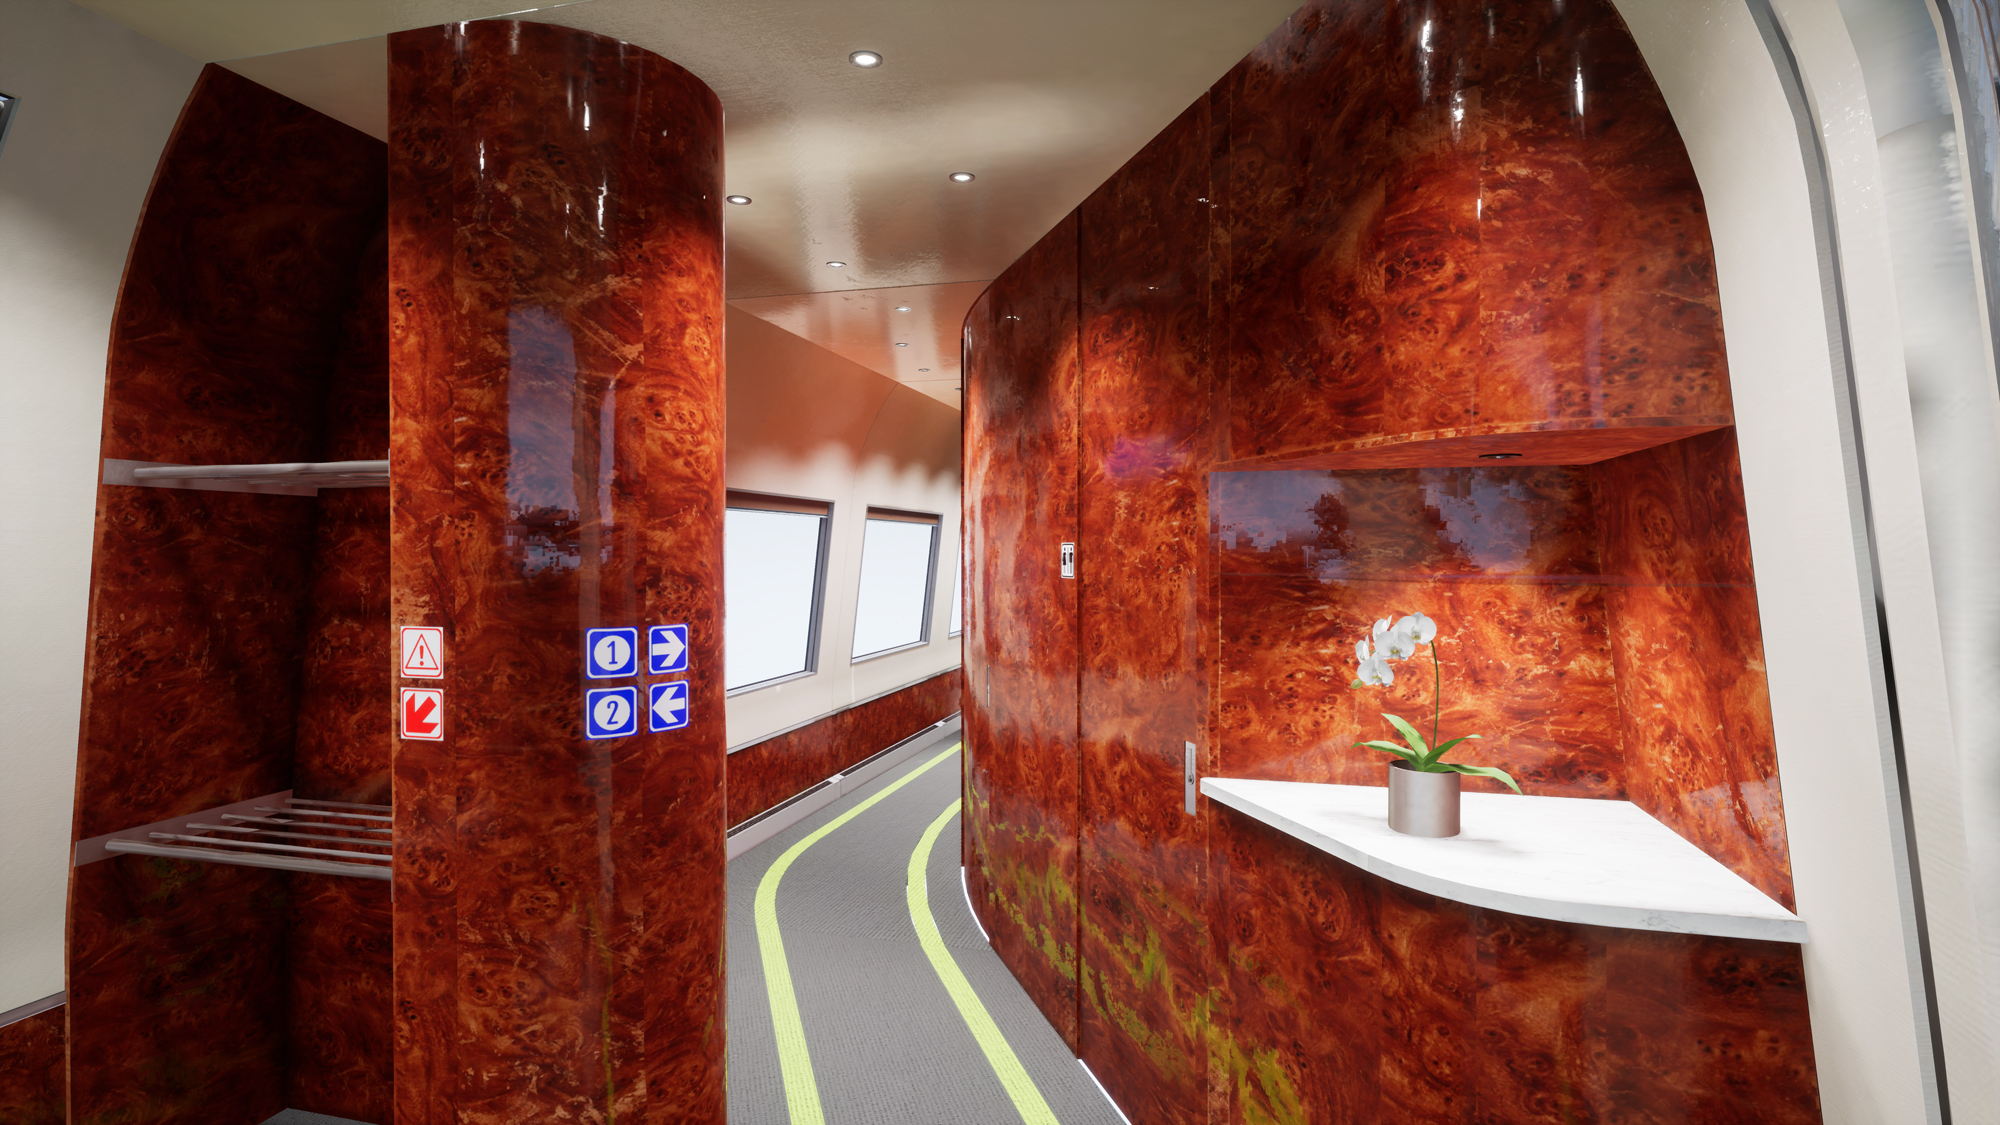 Amtrak - New Acela High-Speed Rail Interior